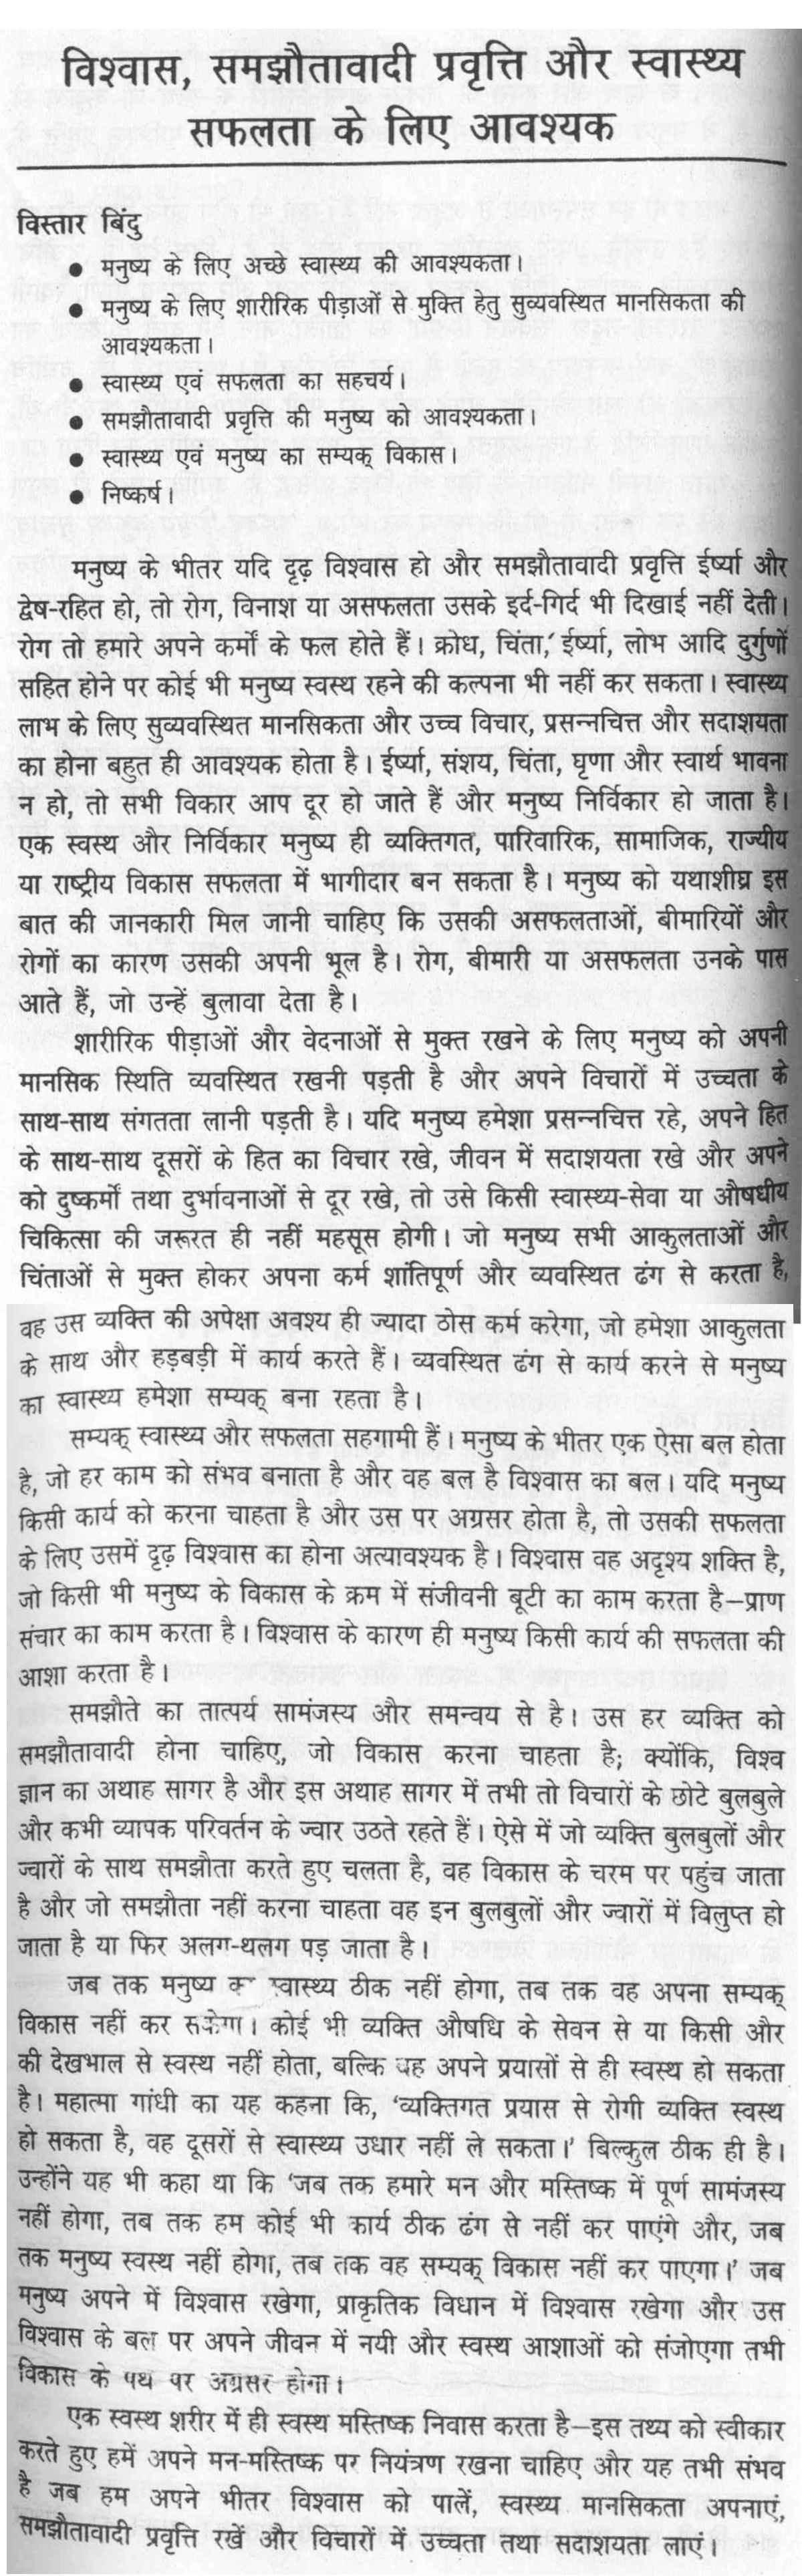 004 Success Essay 10085 Thumb Wonderful Outline Formula In Hindi Education Is Key To Full